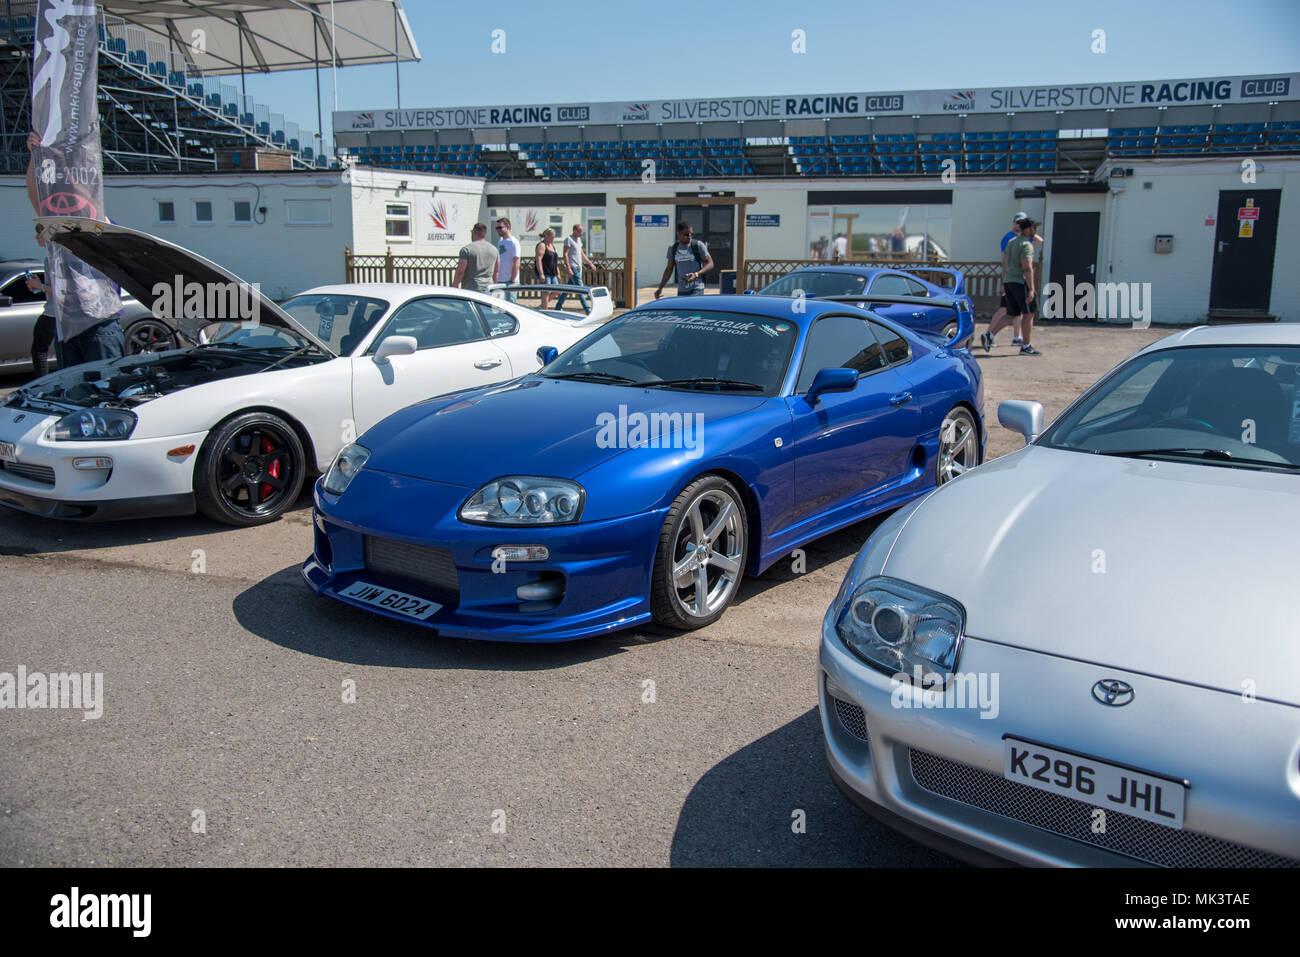 Kelebihan Kekurangan Toyota Supra 2002 Tangguh